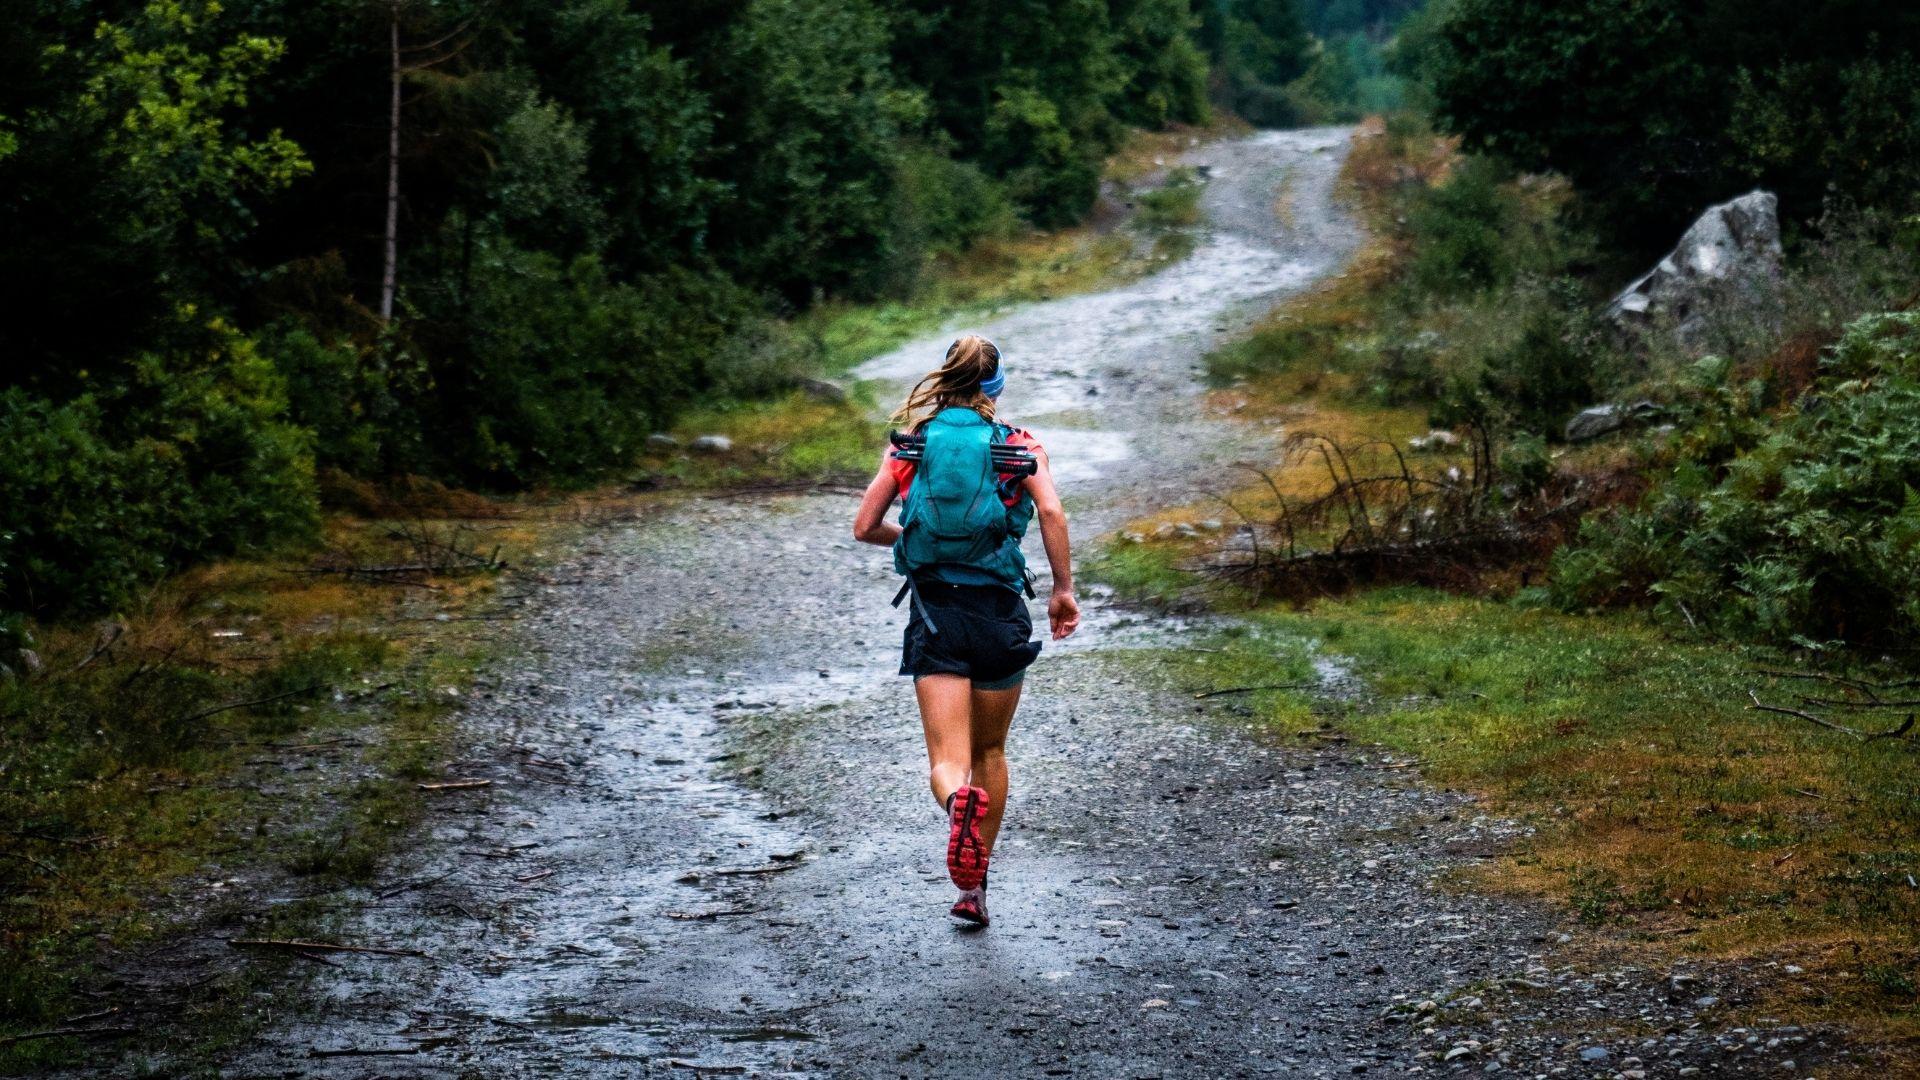 Ultratrailrunner Athlete Kirra Balmanno running